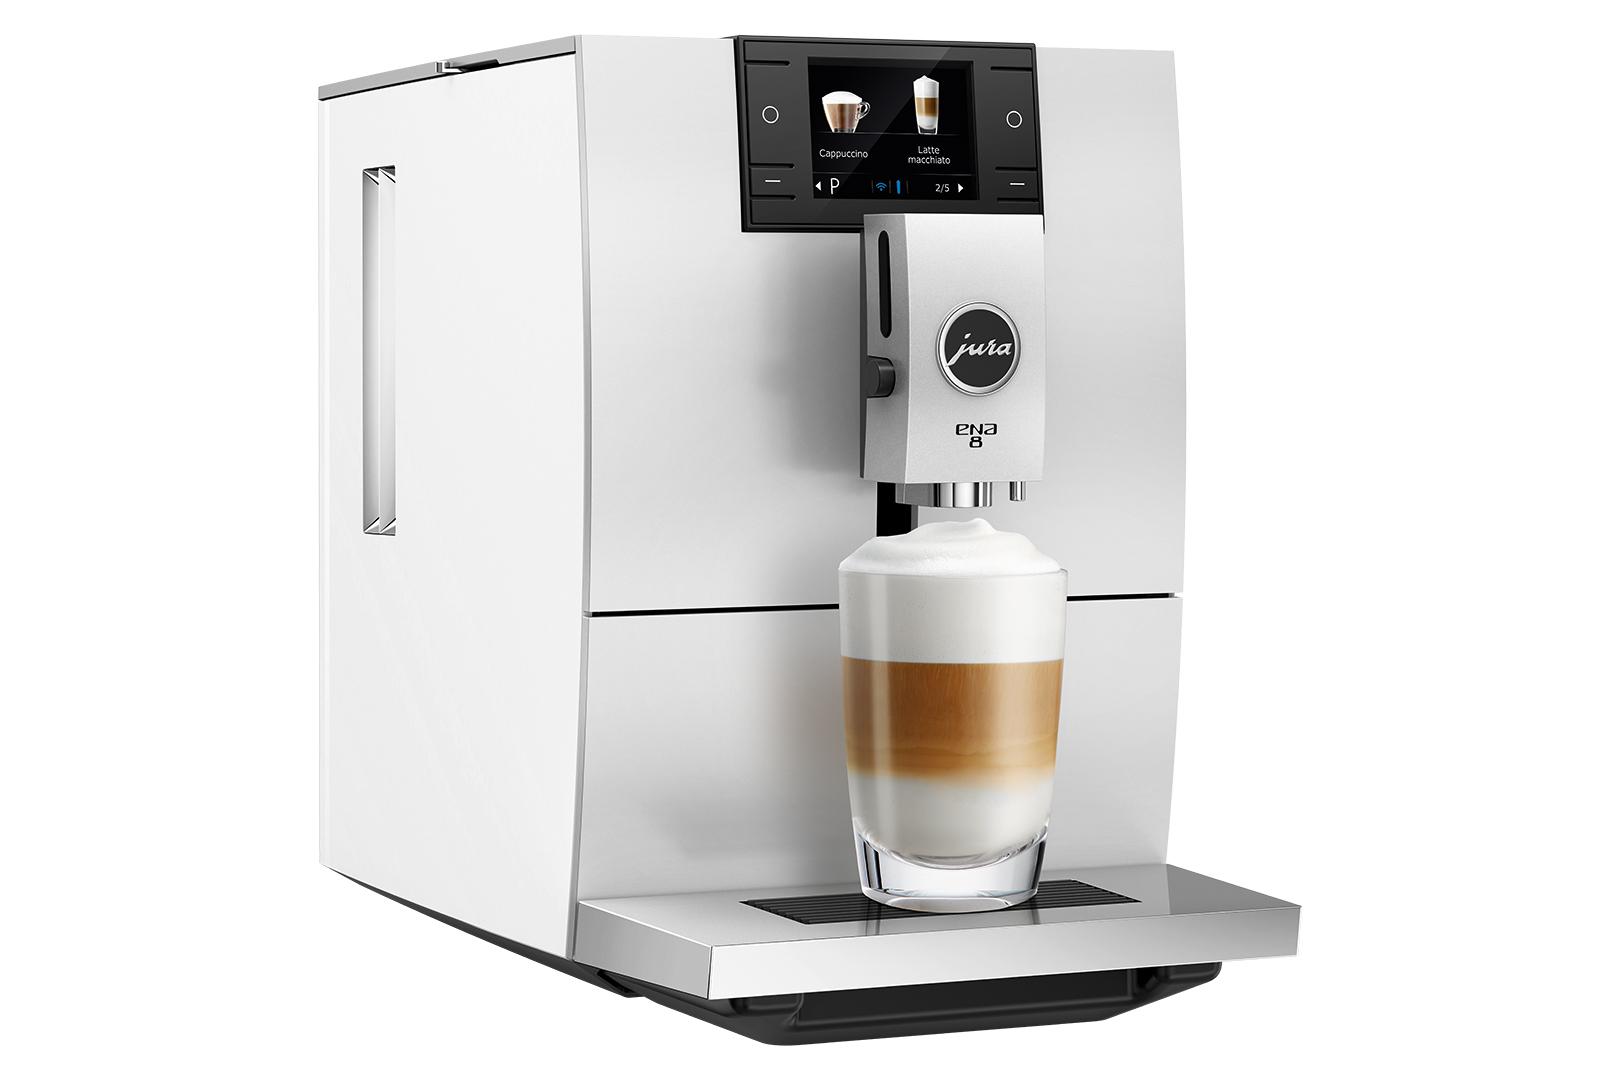 Carolina Coffee Jura ENA 8 - Nordic White